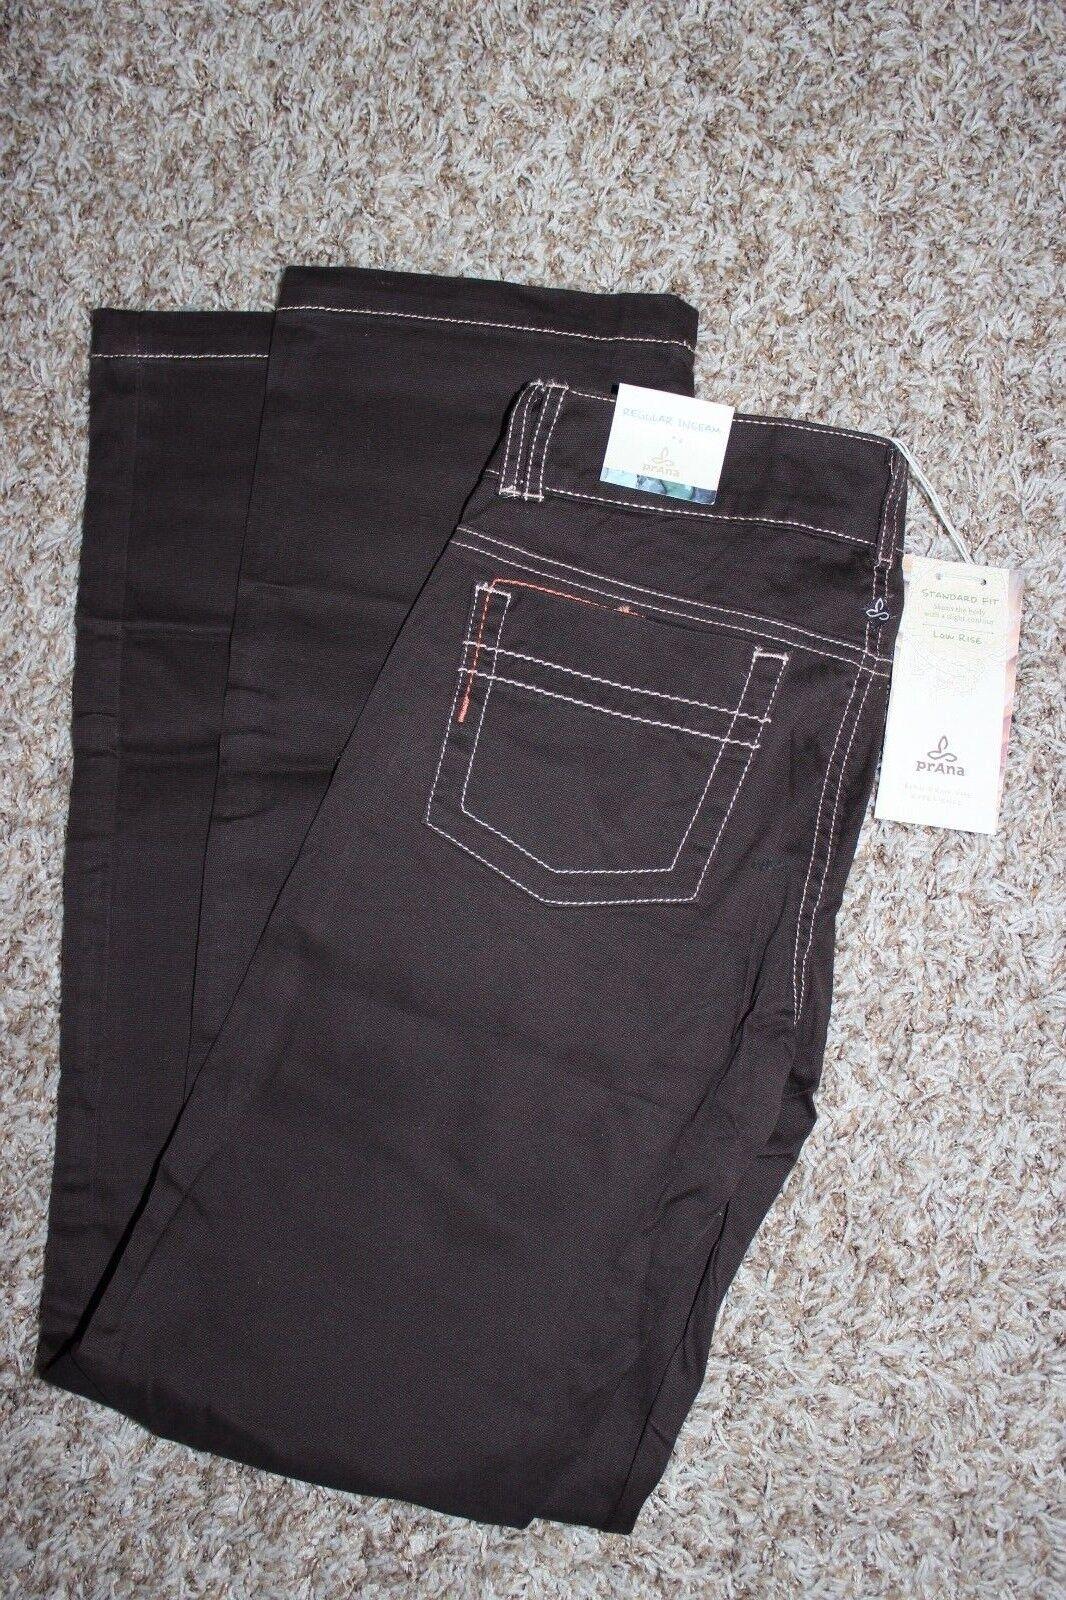 NWT  PrAna Bedford Canyon Organic Cotton Espresso Pants 0R